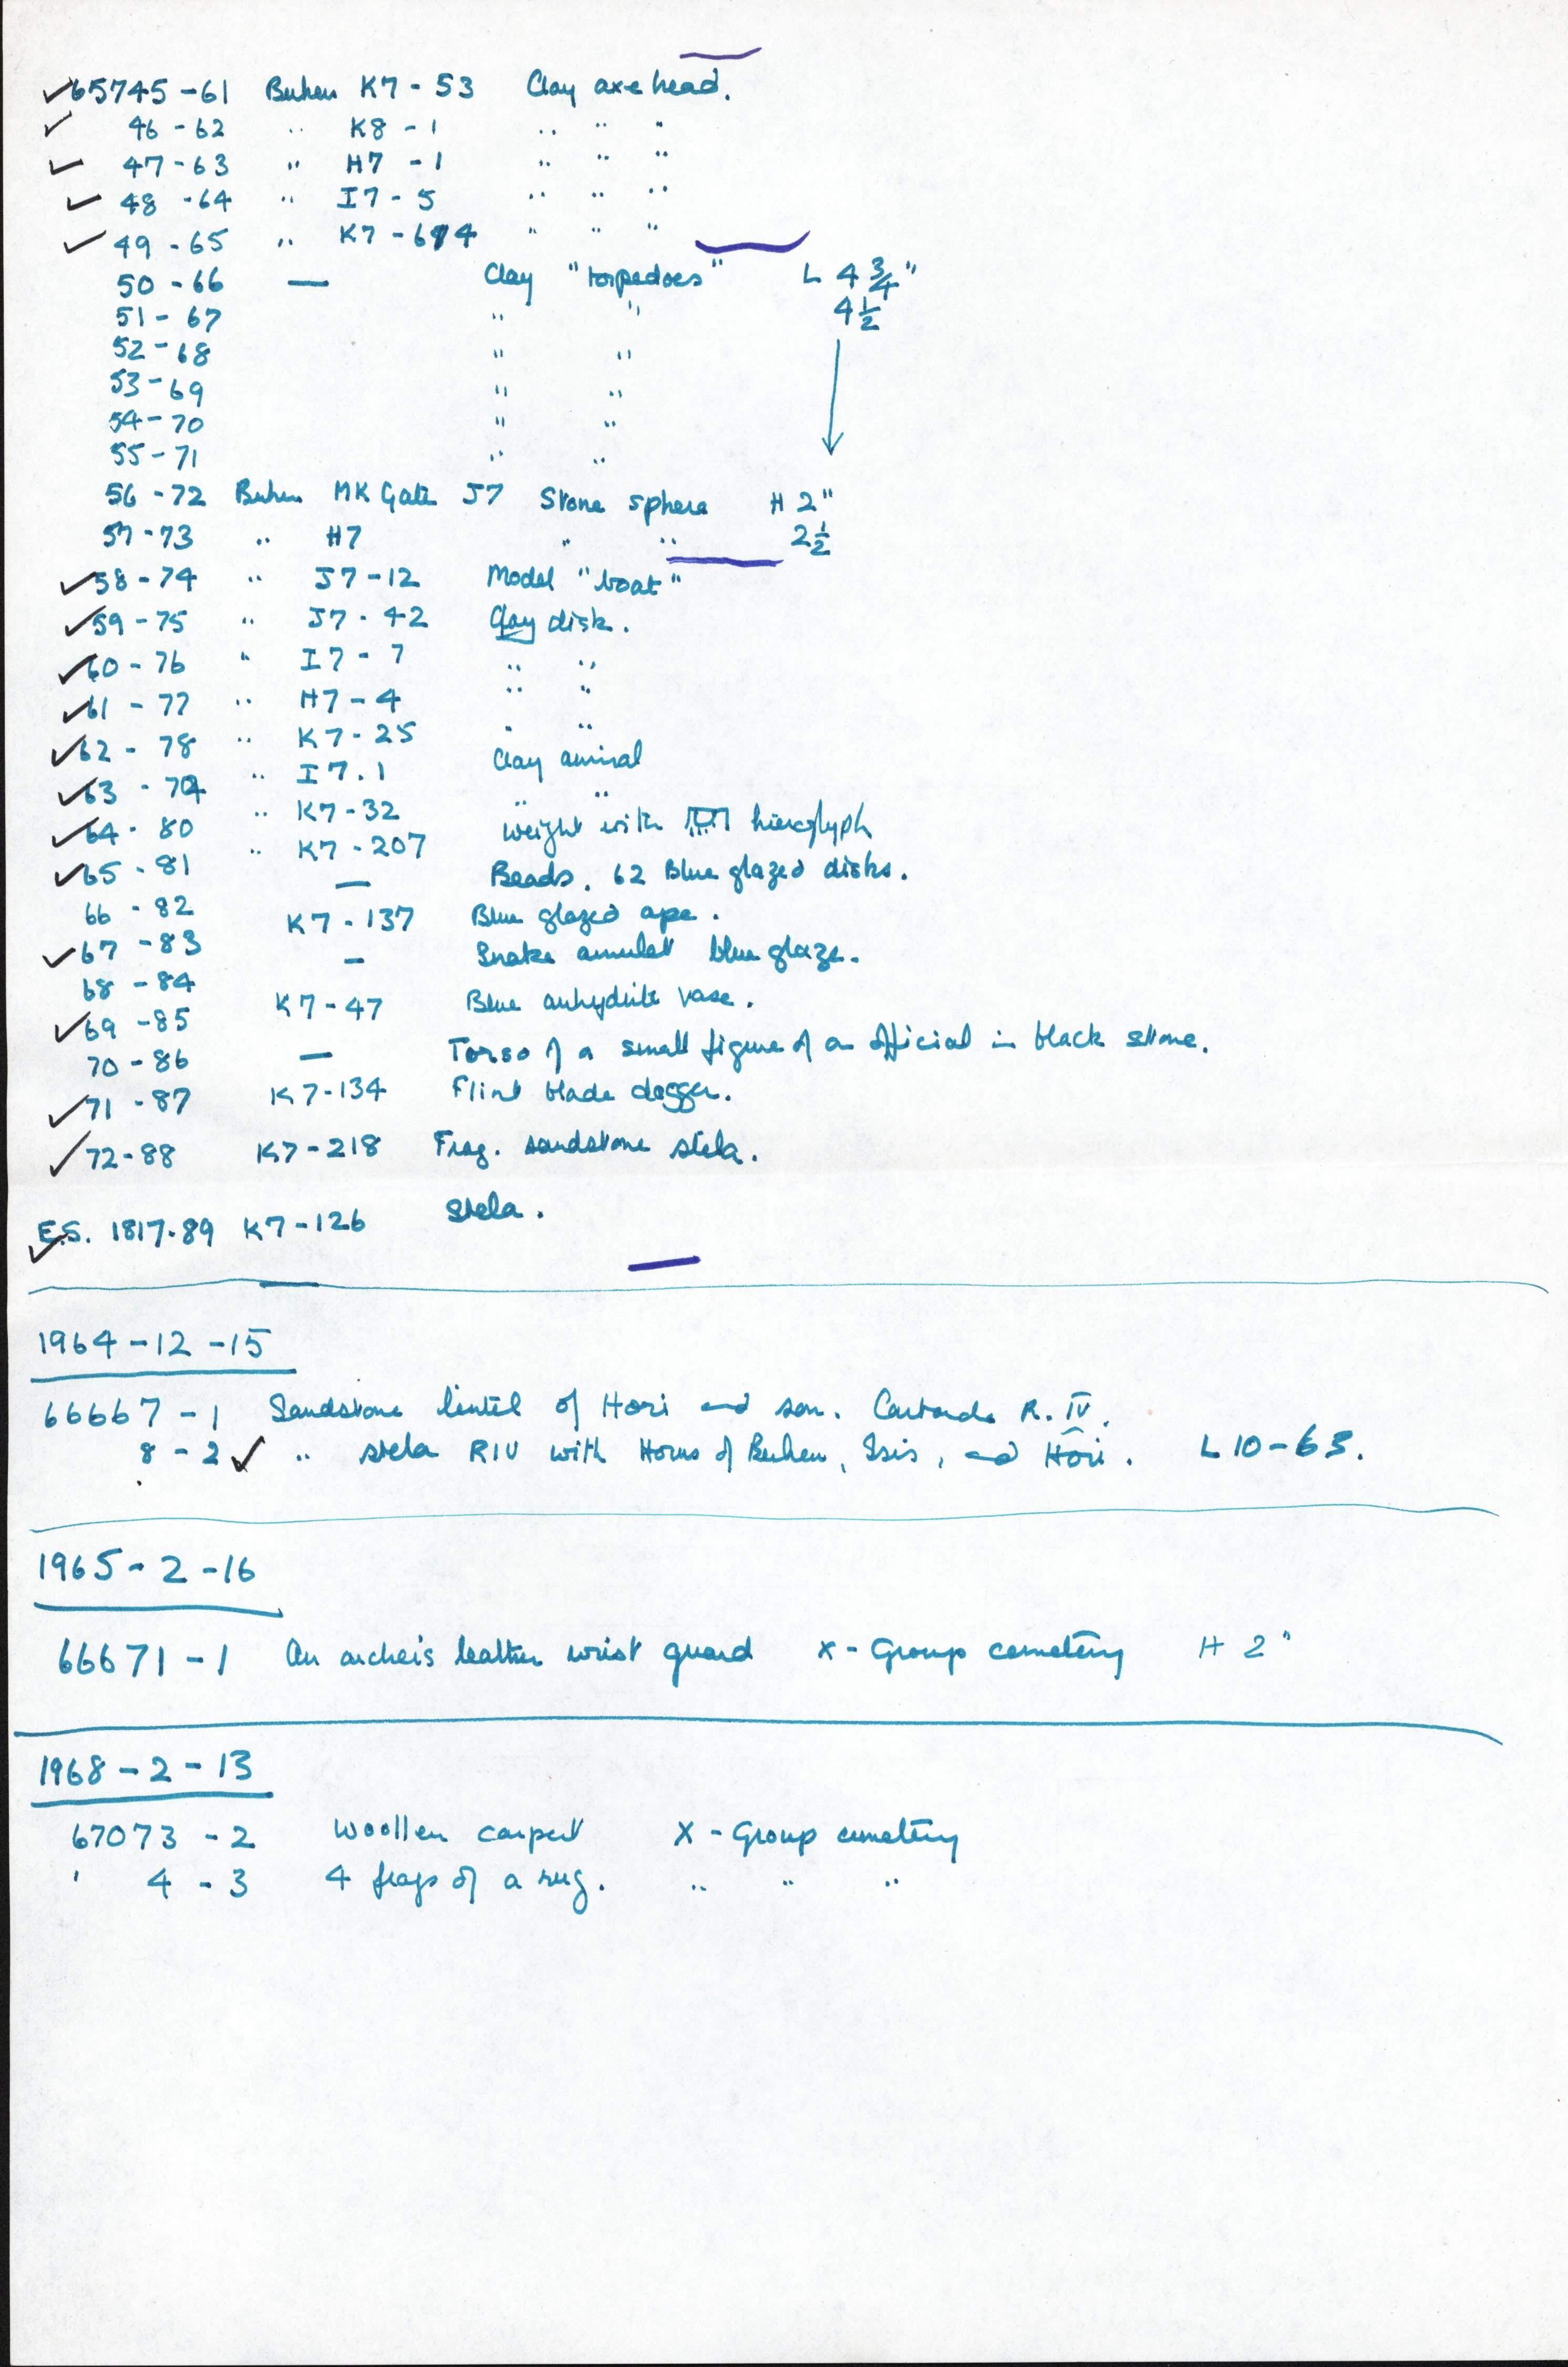 1959-74  Buhen DIST.68.42b